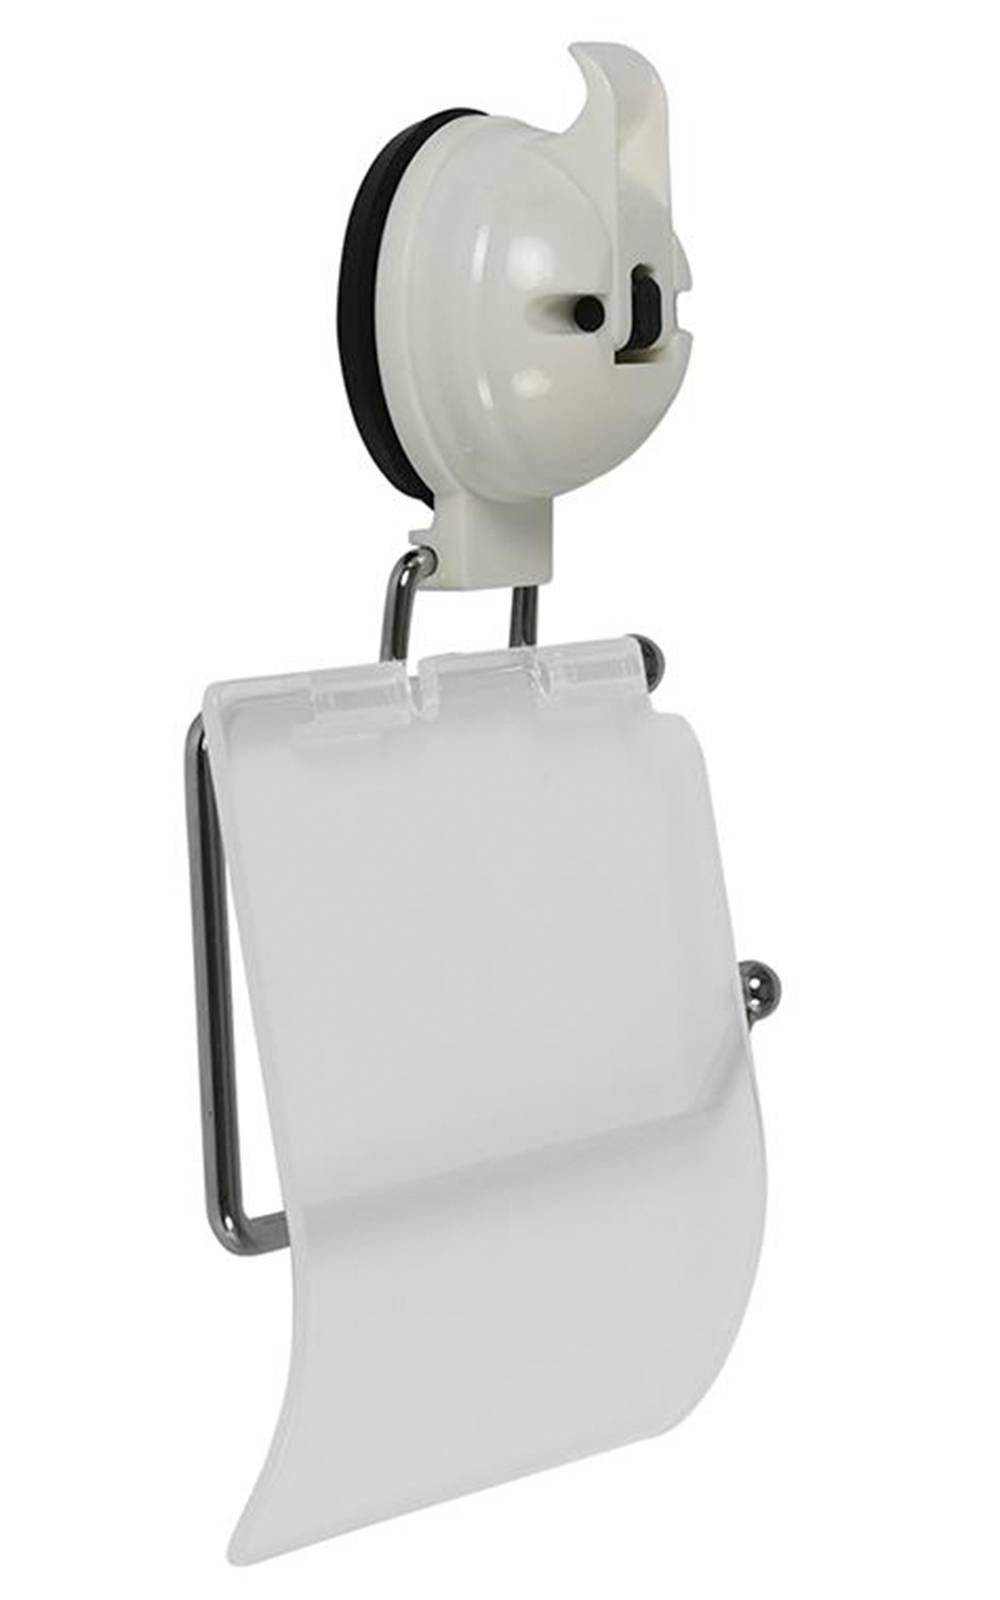 toilettenpapierhalter mit saugnapf edelstahl kunststoff. Black Bedroom Furniture Sets. Home Design Ideas